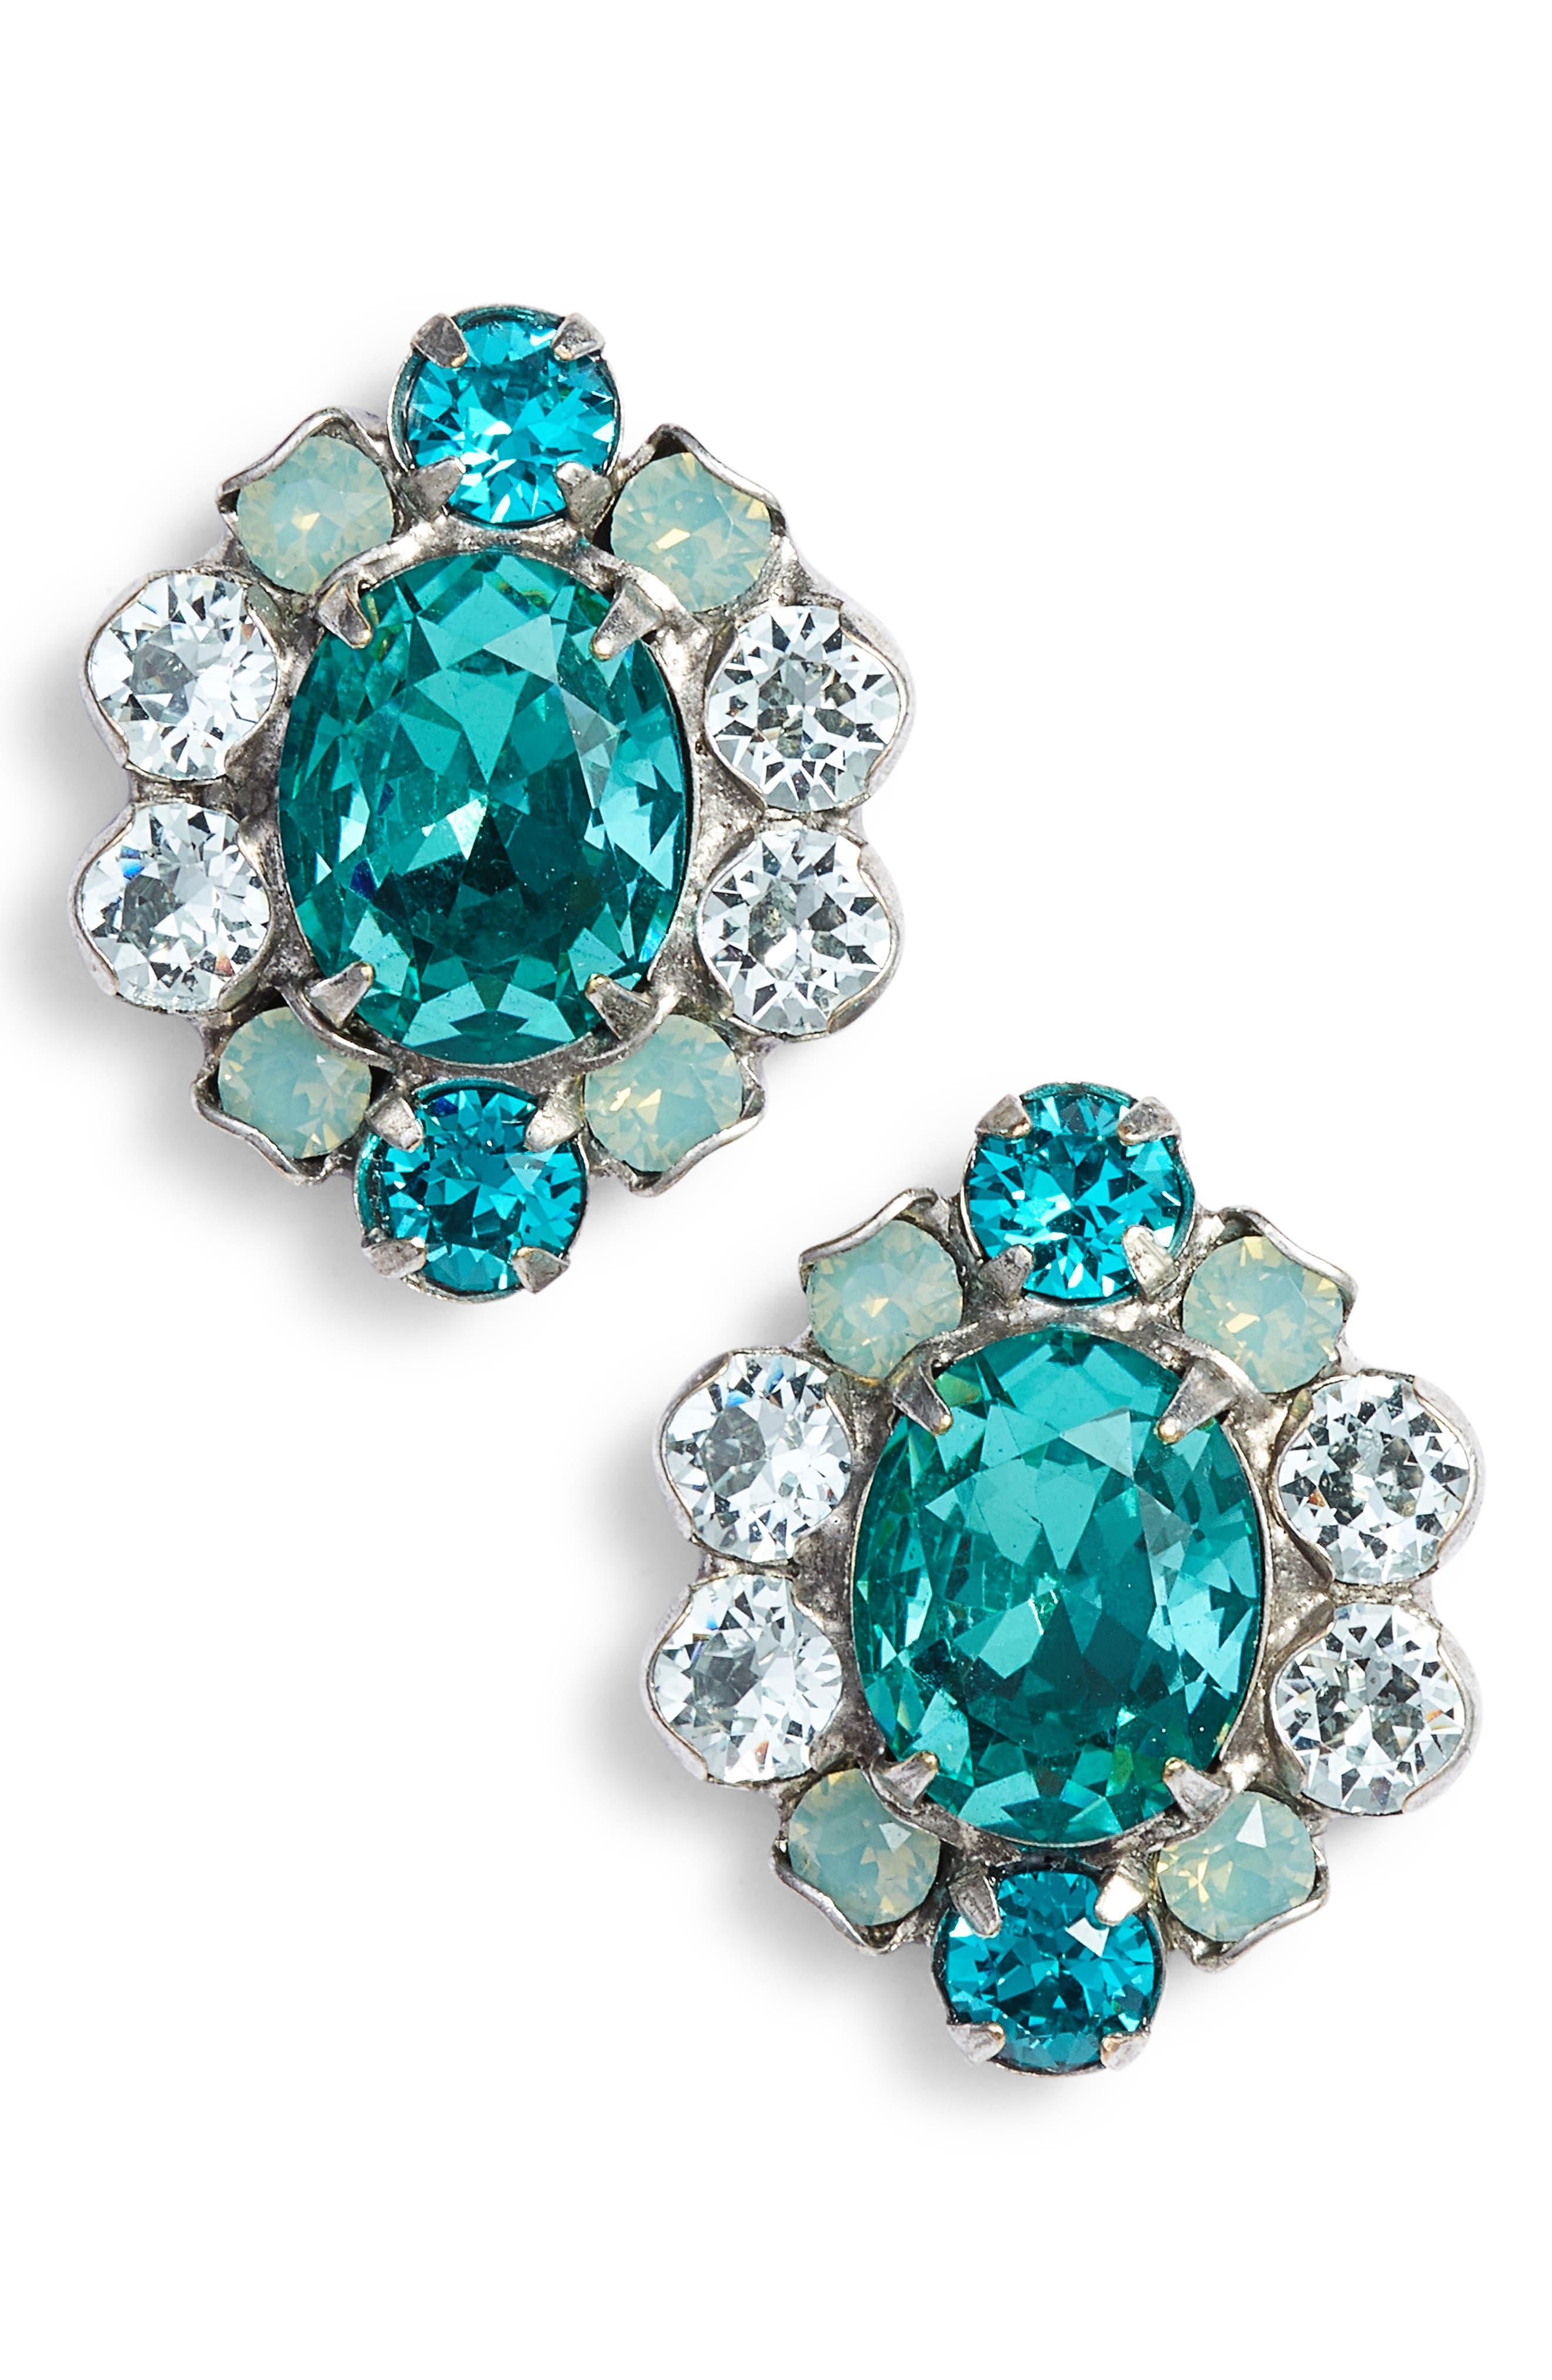 Sundrop Crystal Earrings,                             Main thumbnail 1, color,                             BLUE-GREEN